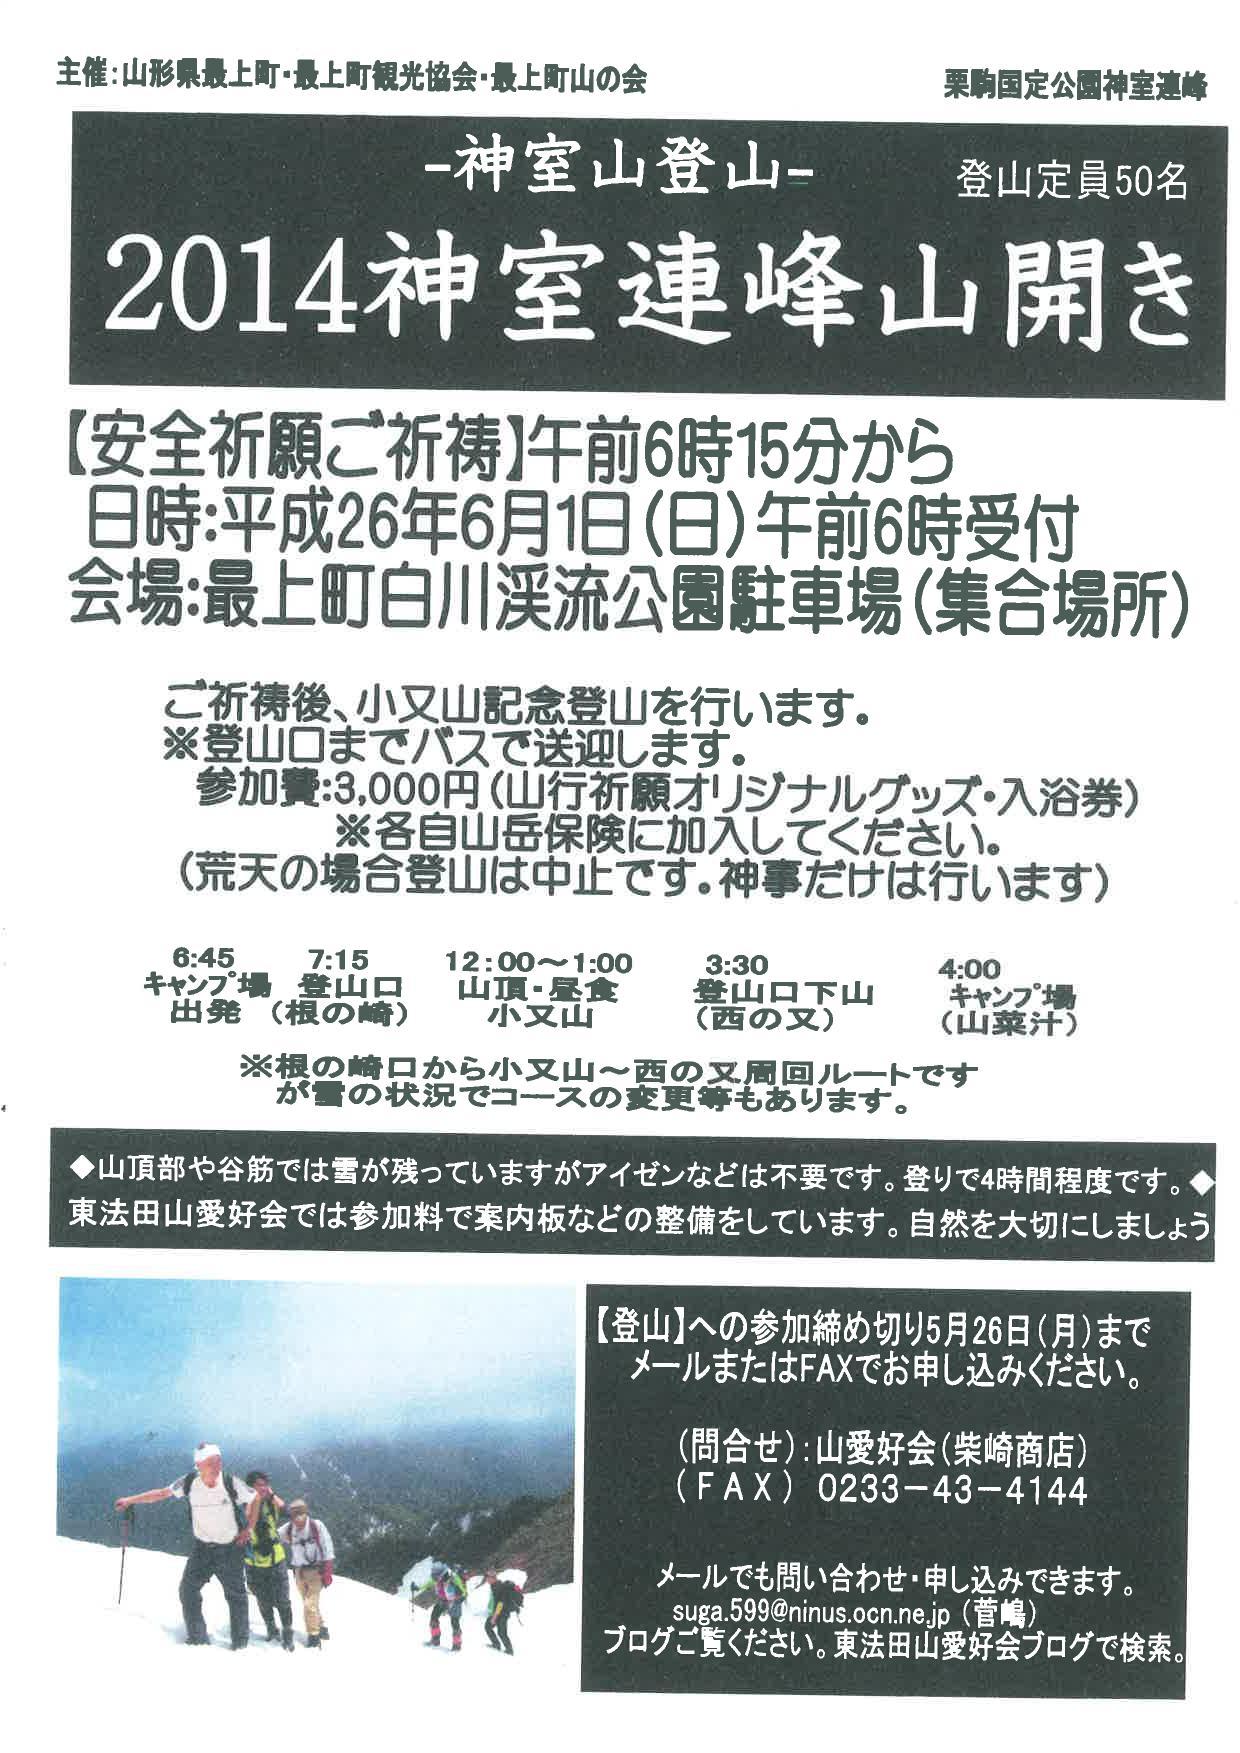 http://akakura-spa.com/oshirase/blog/201404141711070001.jpg